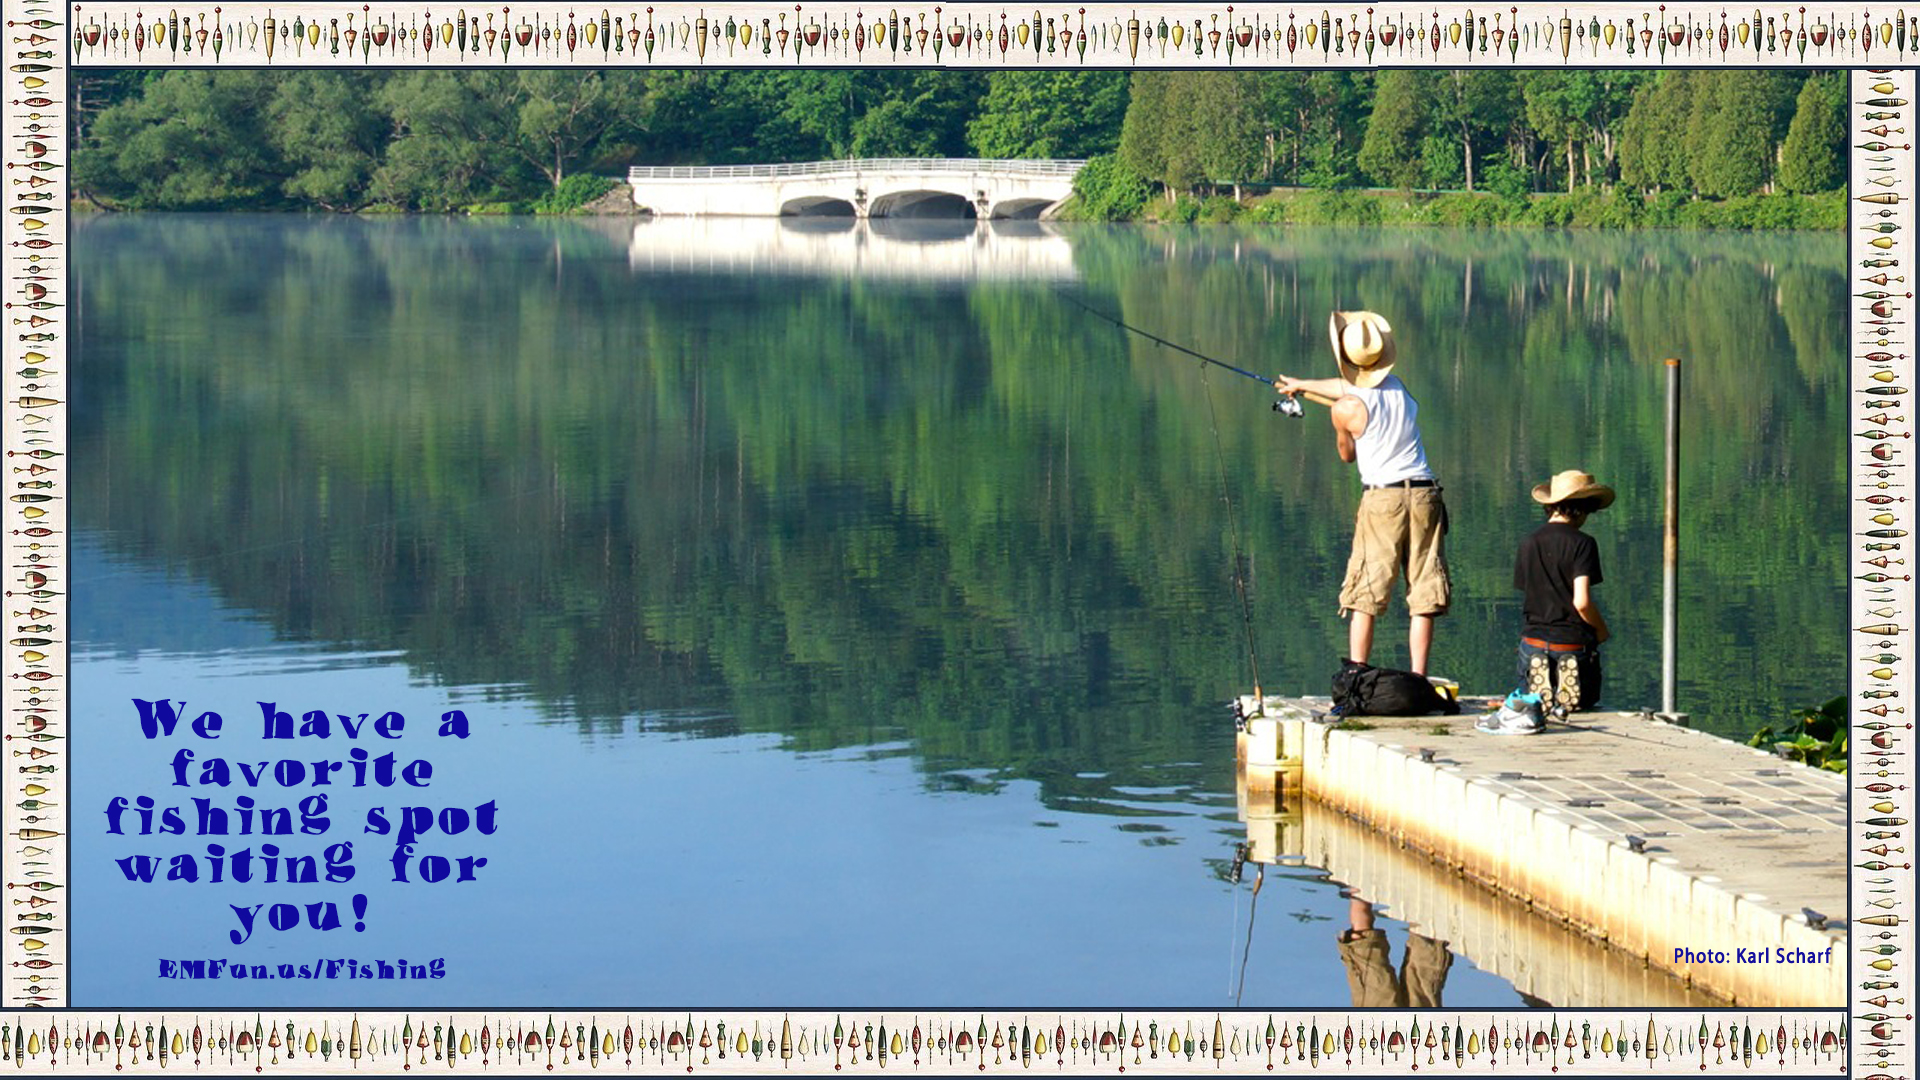 Fishing in Cattaraugus County